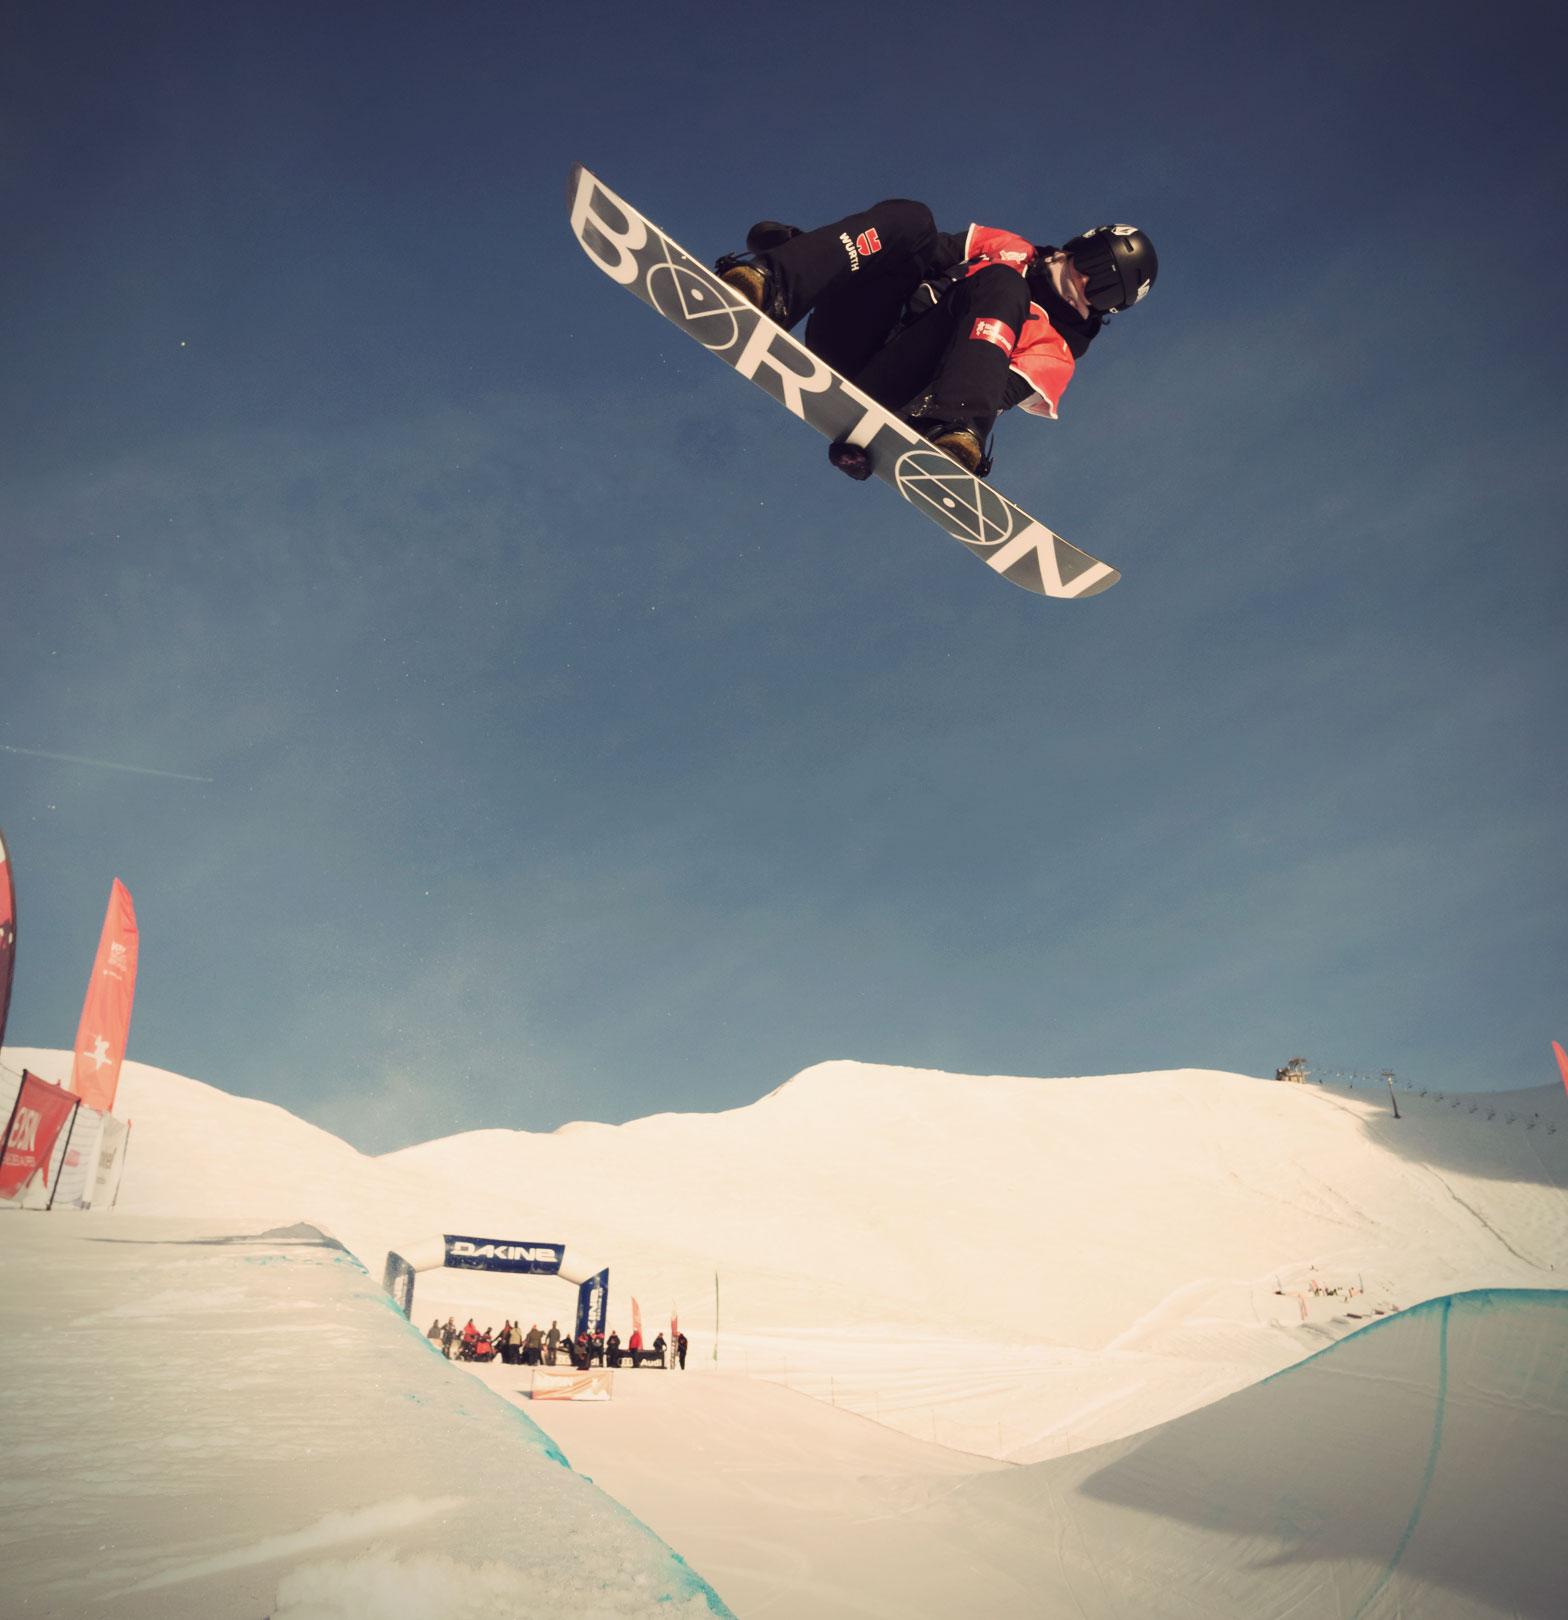 TSG Kids Leilani Ettel Snowboard Halfpipe Girl